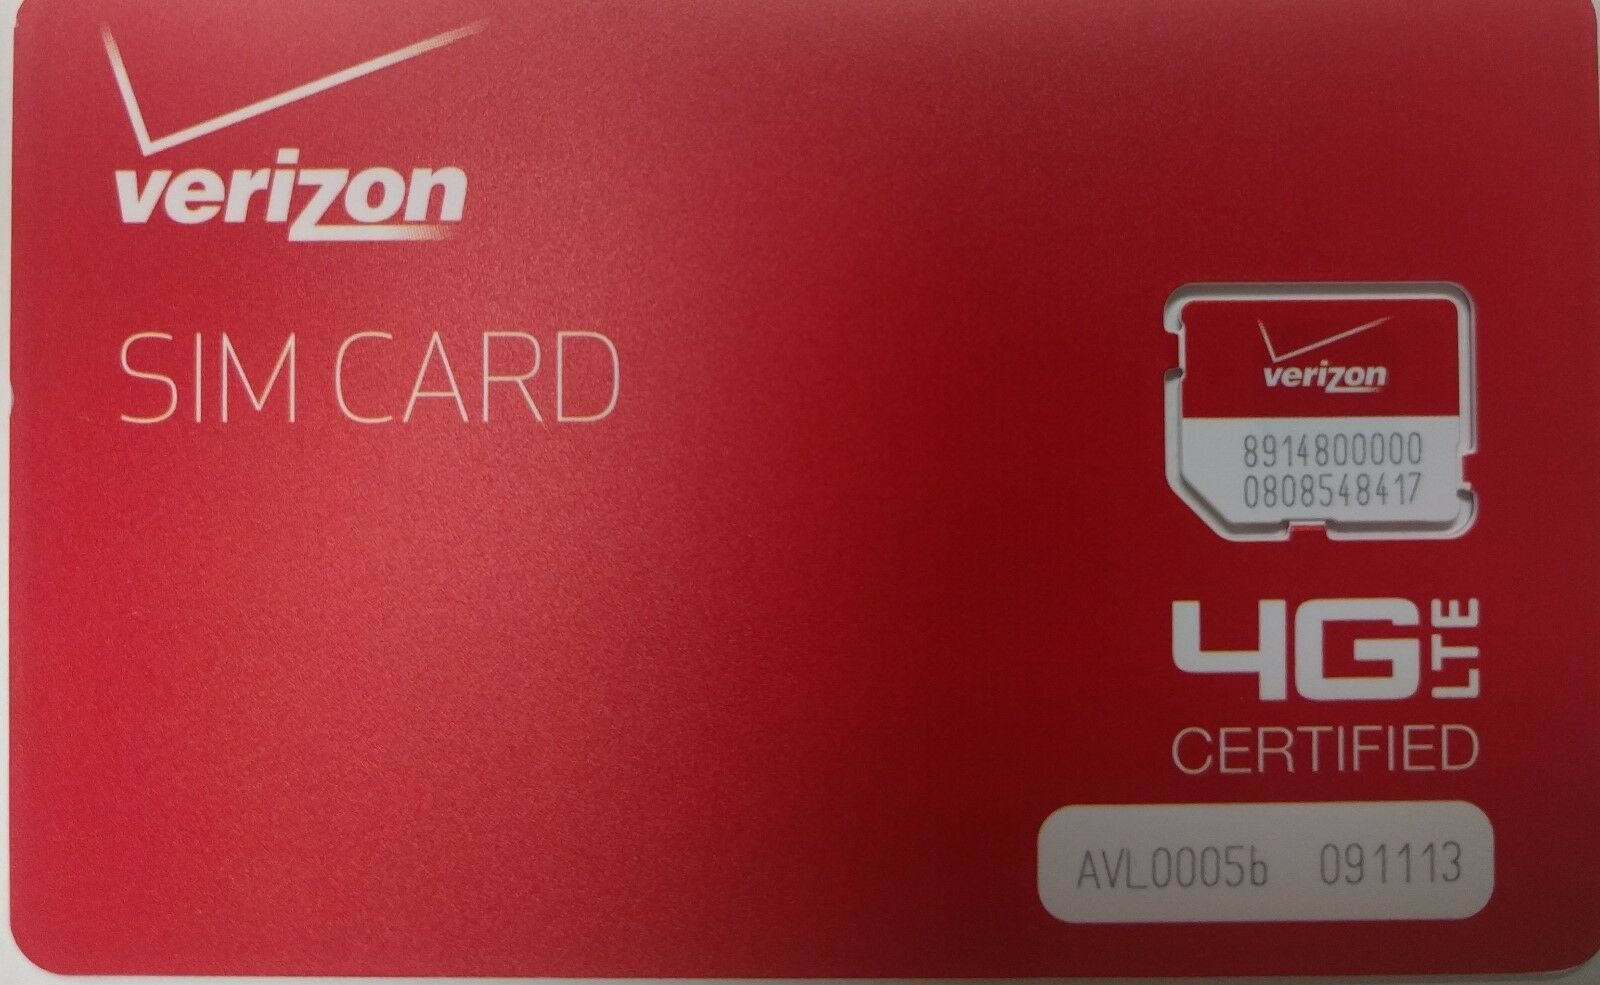 как выглядит SIM-карта для мобильного телефона VERIZON  SIM CARD 4G LTE -  Prepaid or PostPaid - Broadband  NEW. MICRO SIM SIZE фото